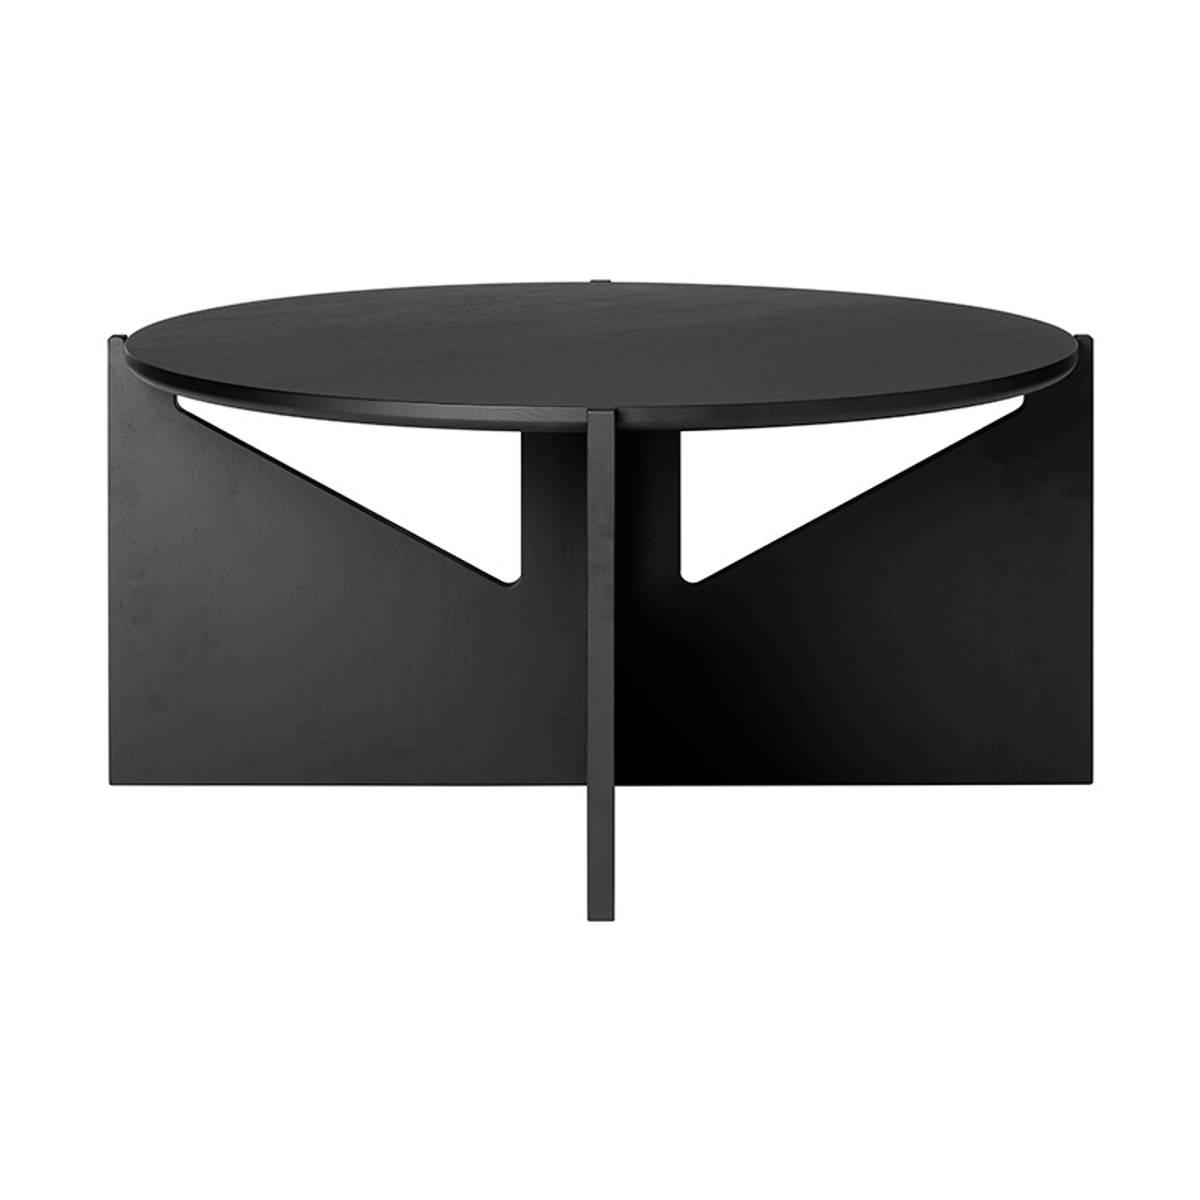 Sofabord XL Table - Kristina Dam Studio